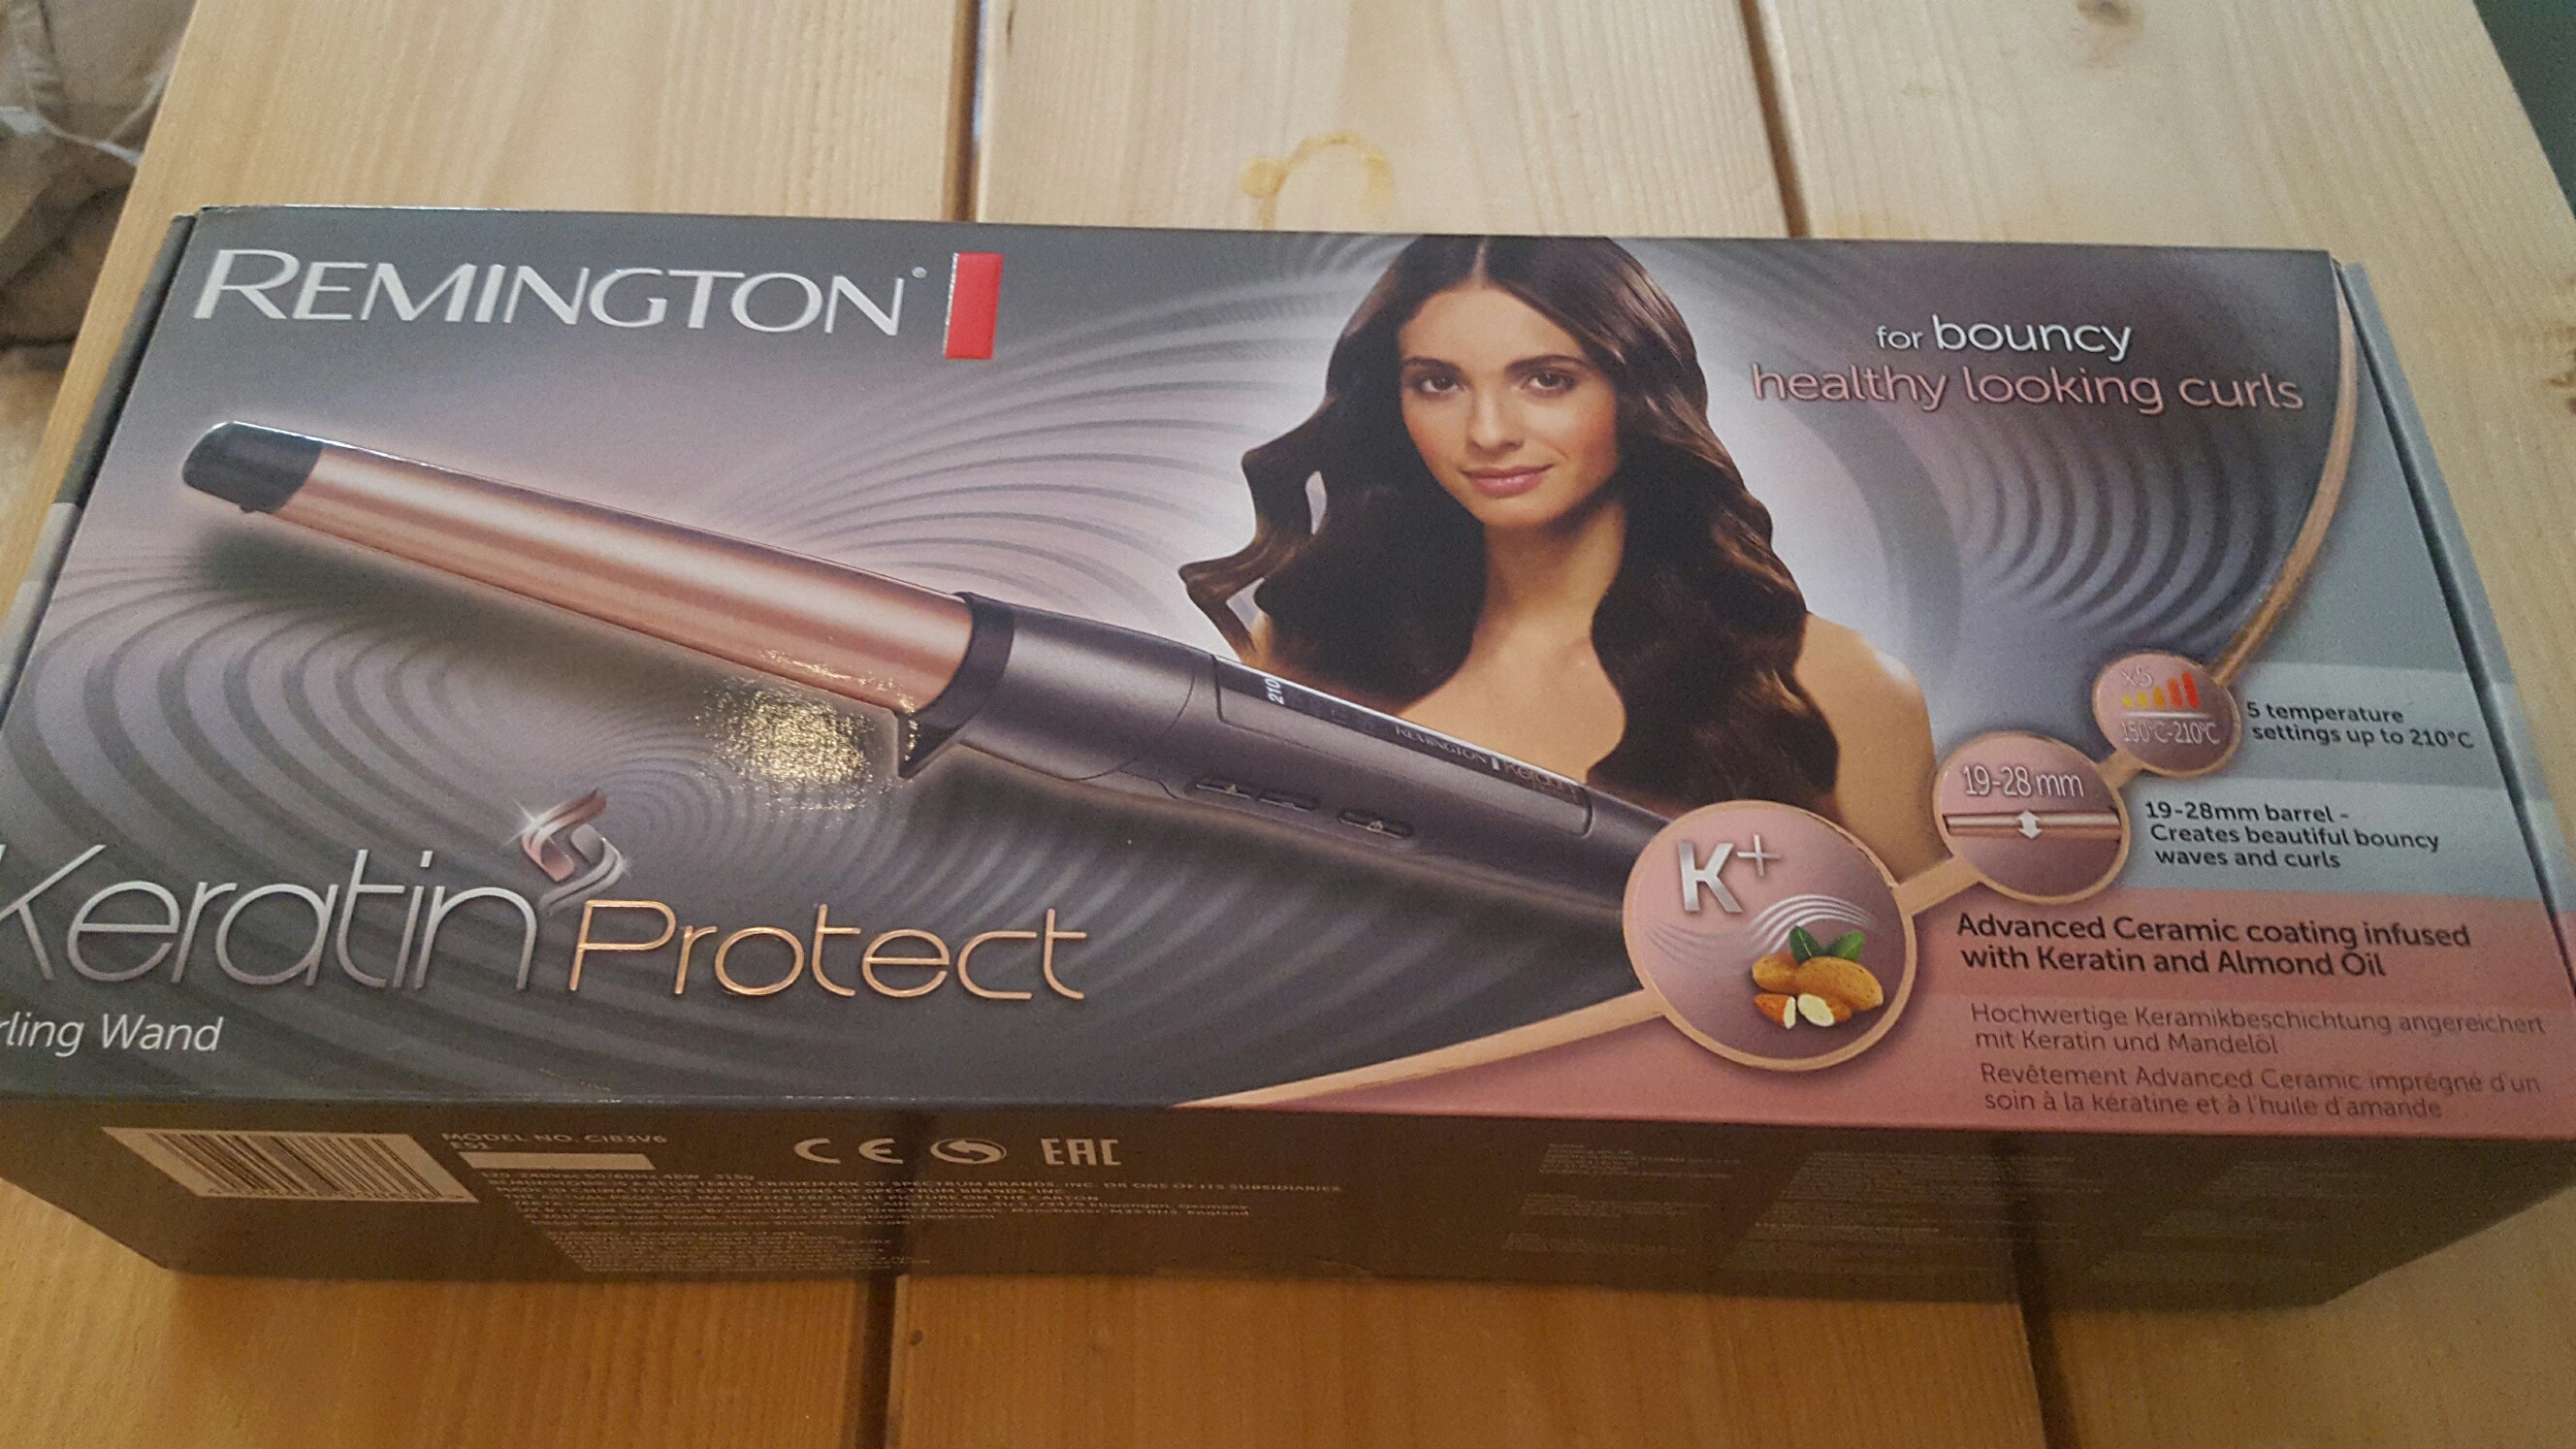 Remington CI83V6 Keratin Protect 19-28 mm Wand